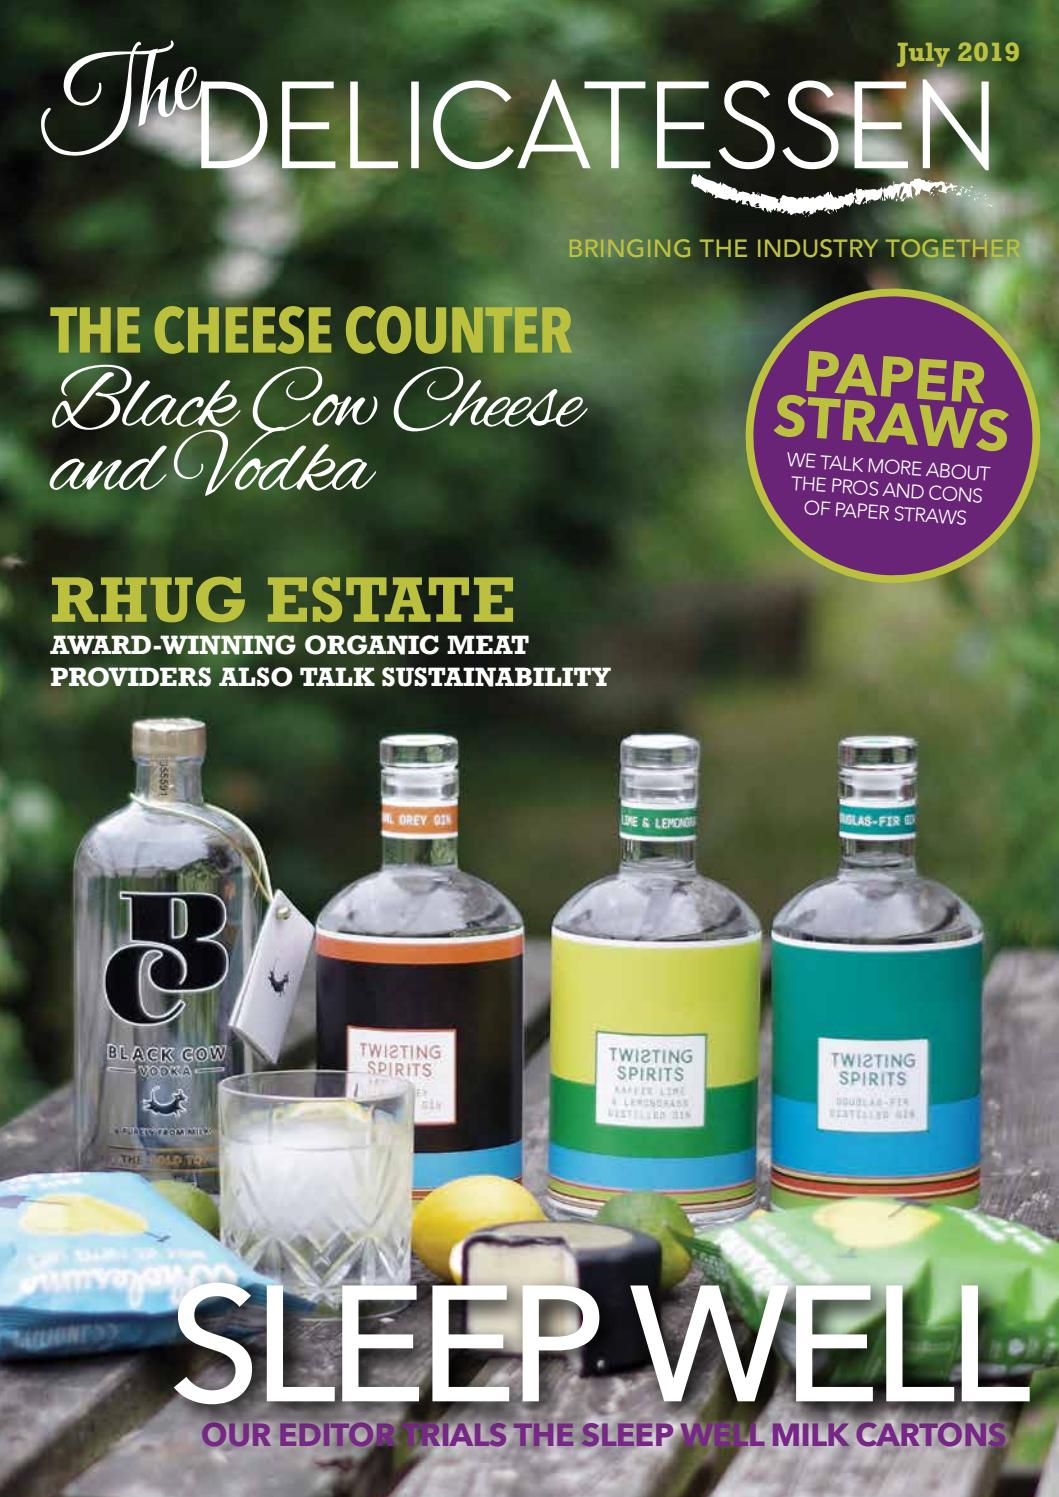 The Delicatessen Magazine July 2019 By Cjm Media Issuu